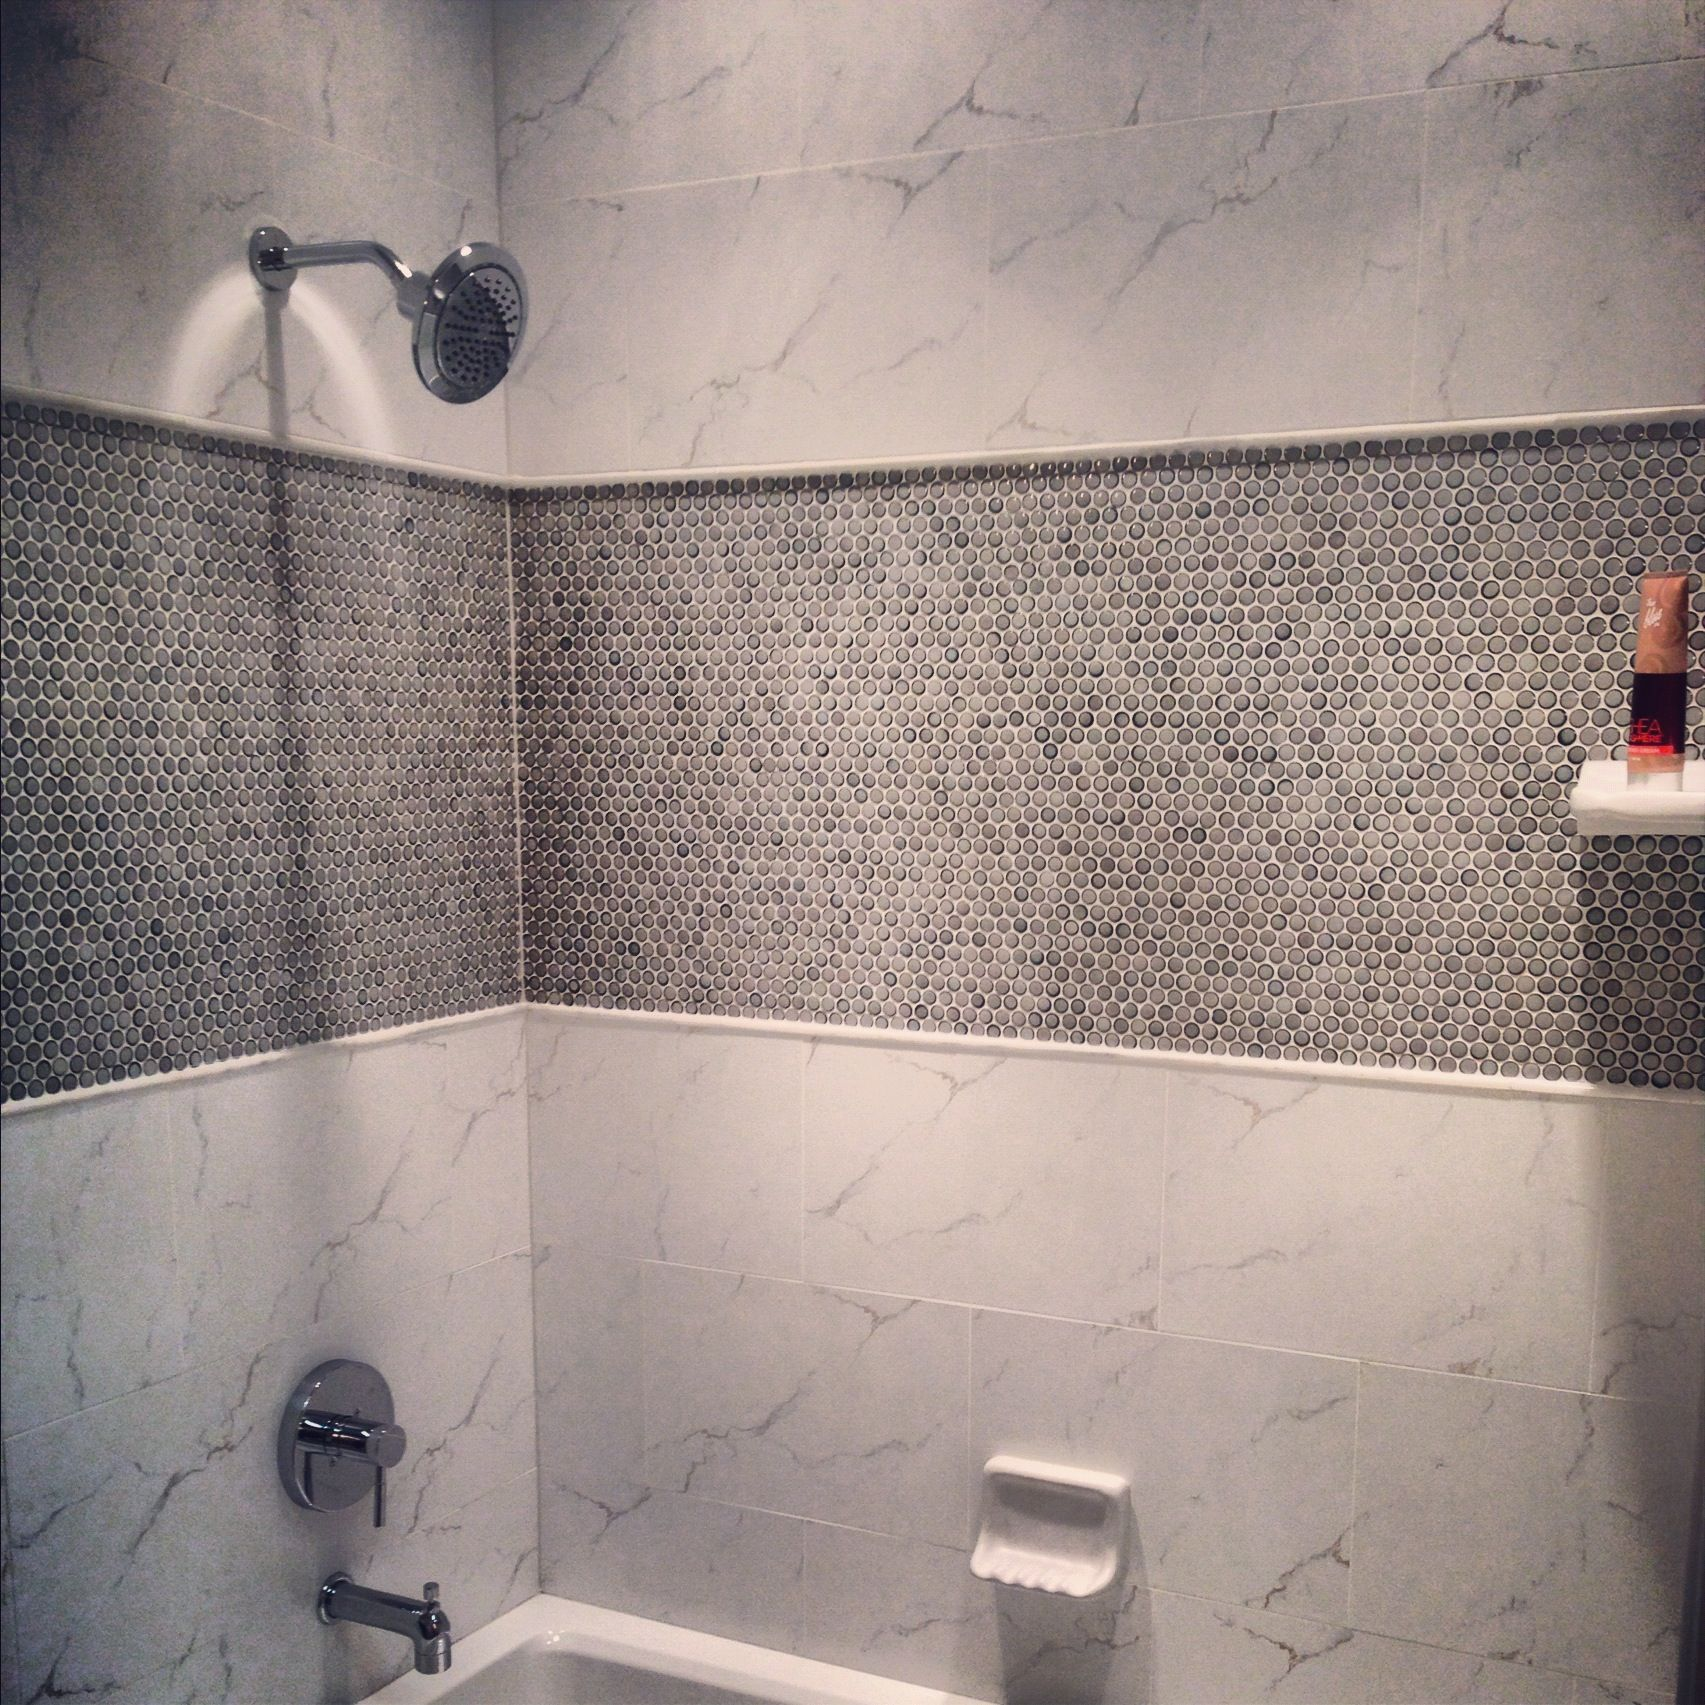 Mosaic Tile Bathroom Shower: Porcelain Penny Round Mosaic Tile In The Shower